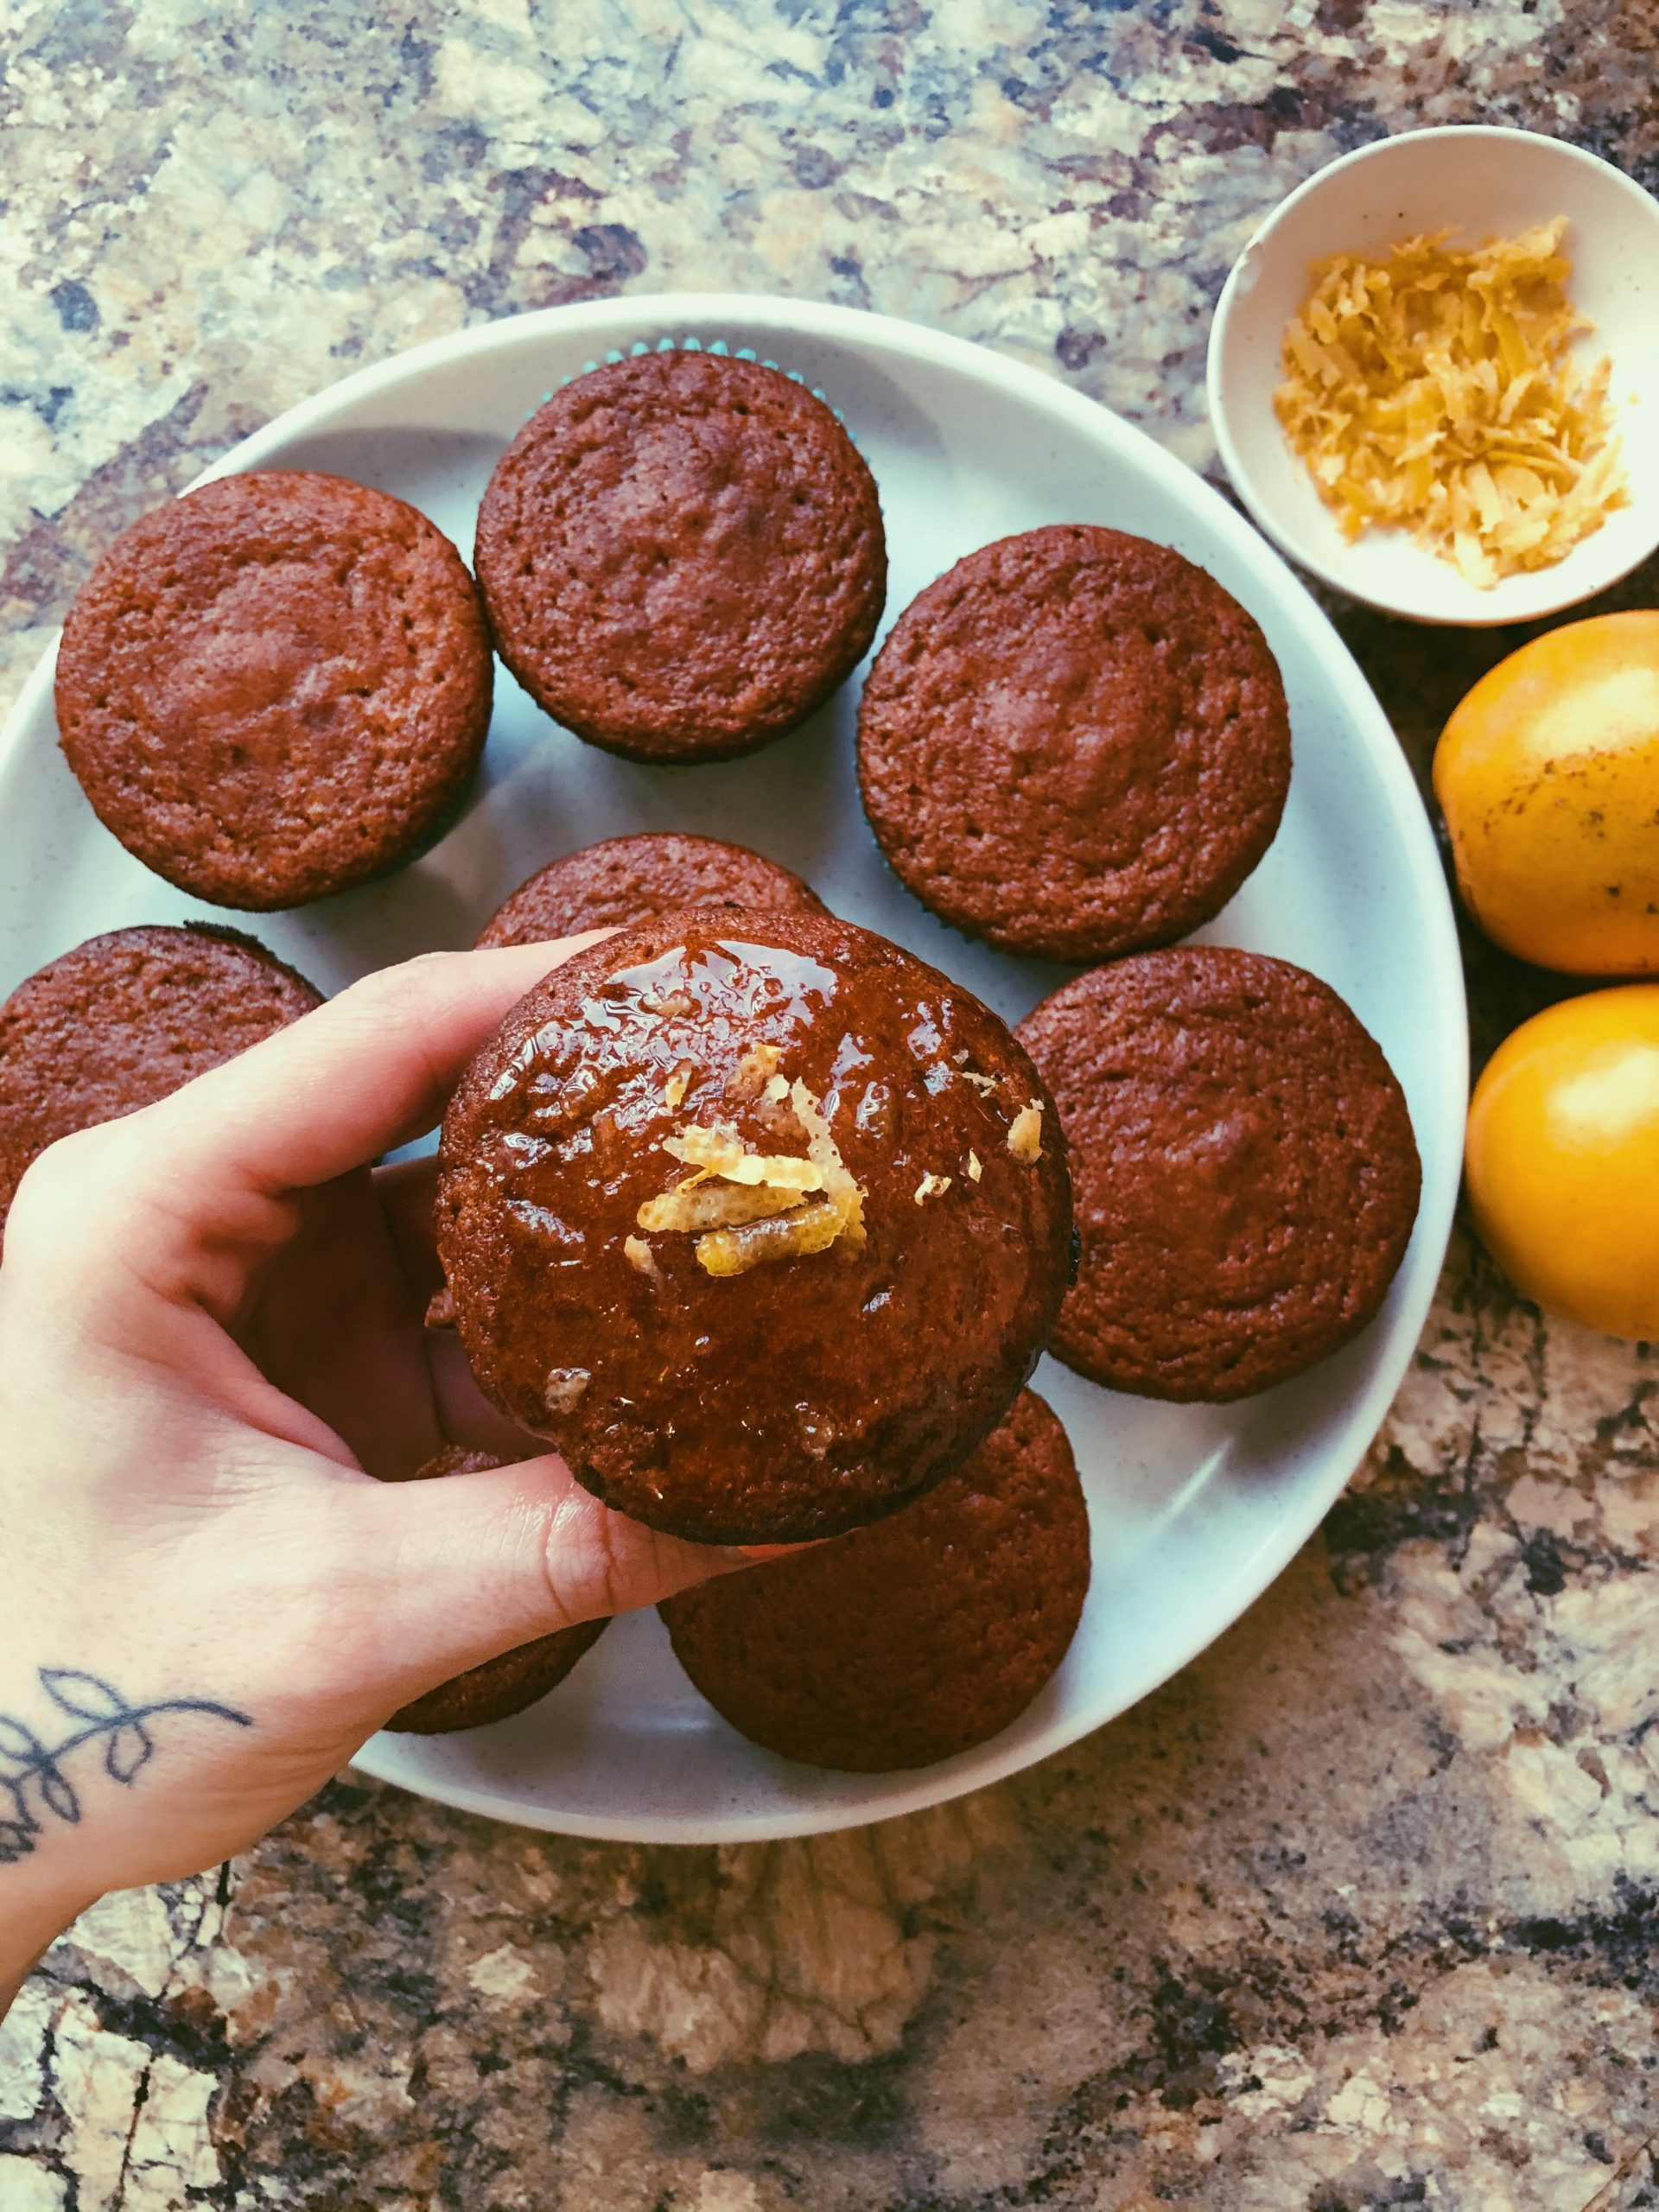 lemon muffins w a lemon-honey glaze (grain free, scd diet)